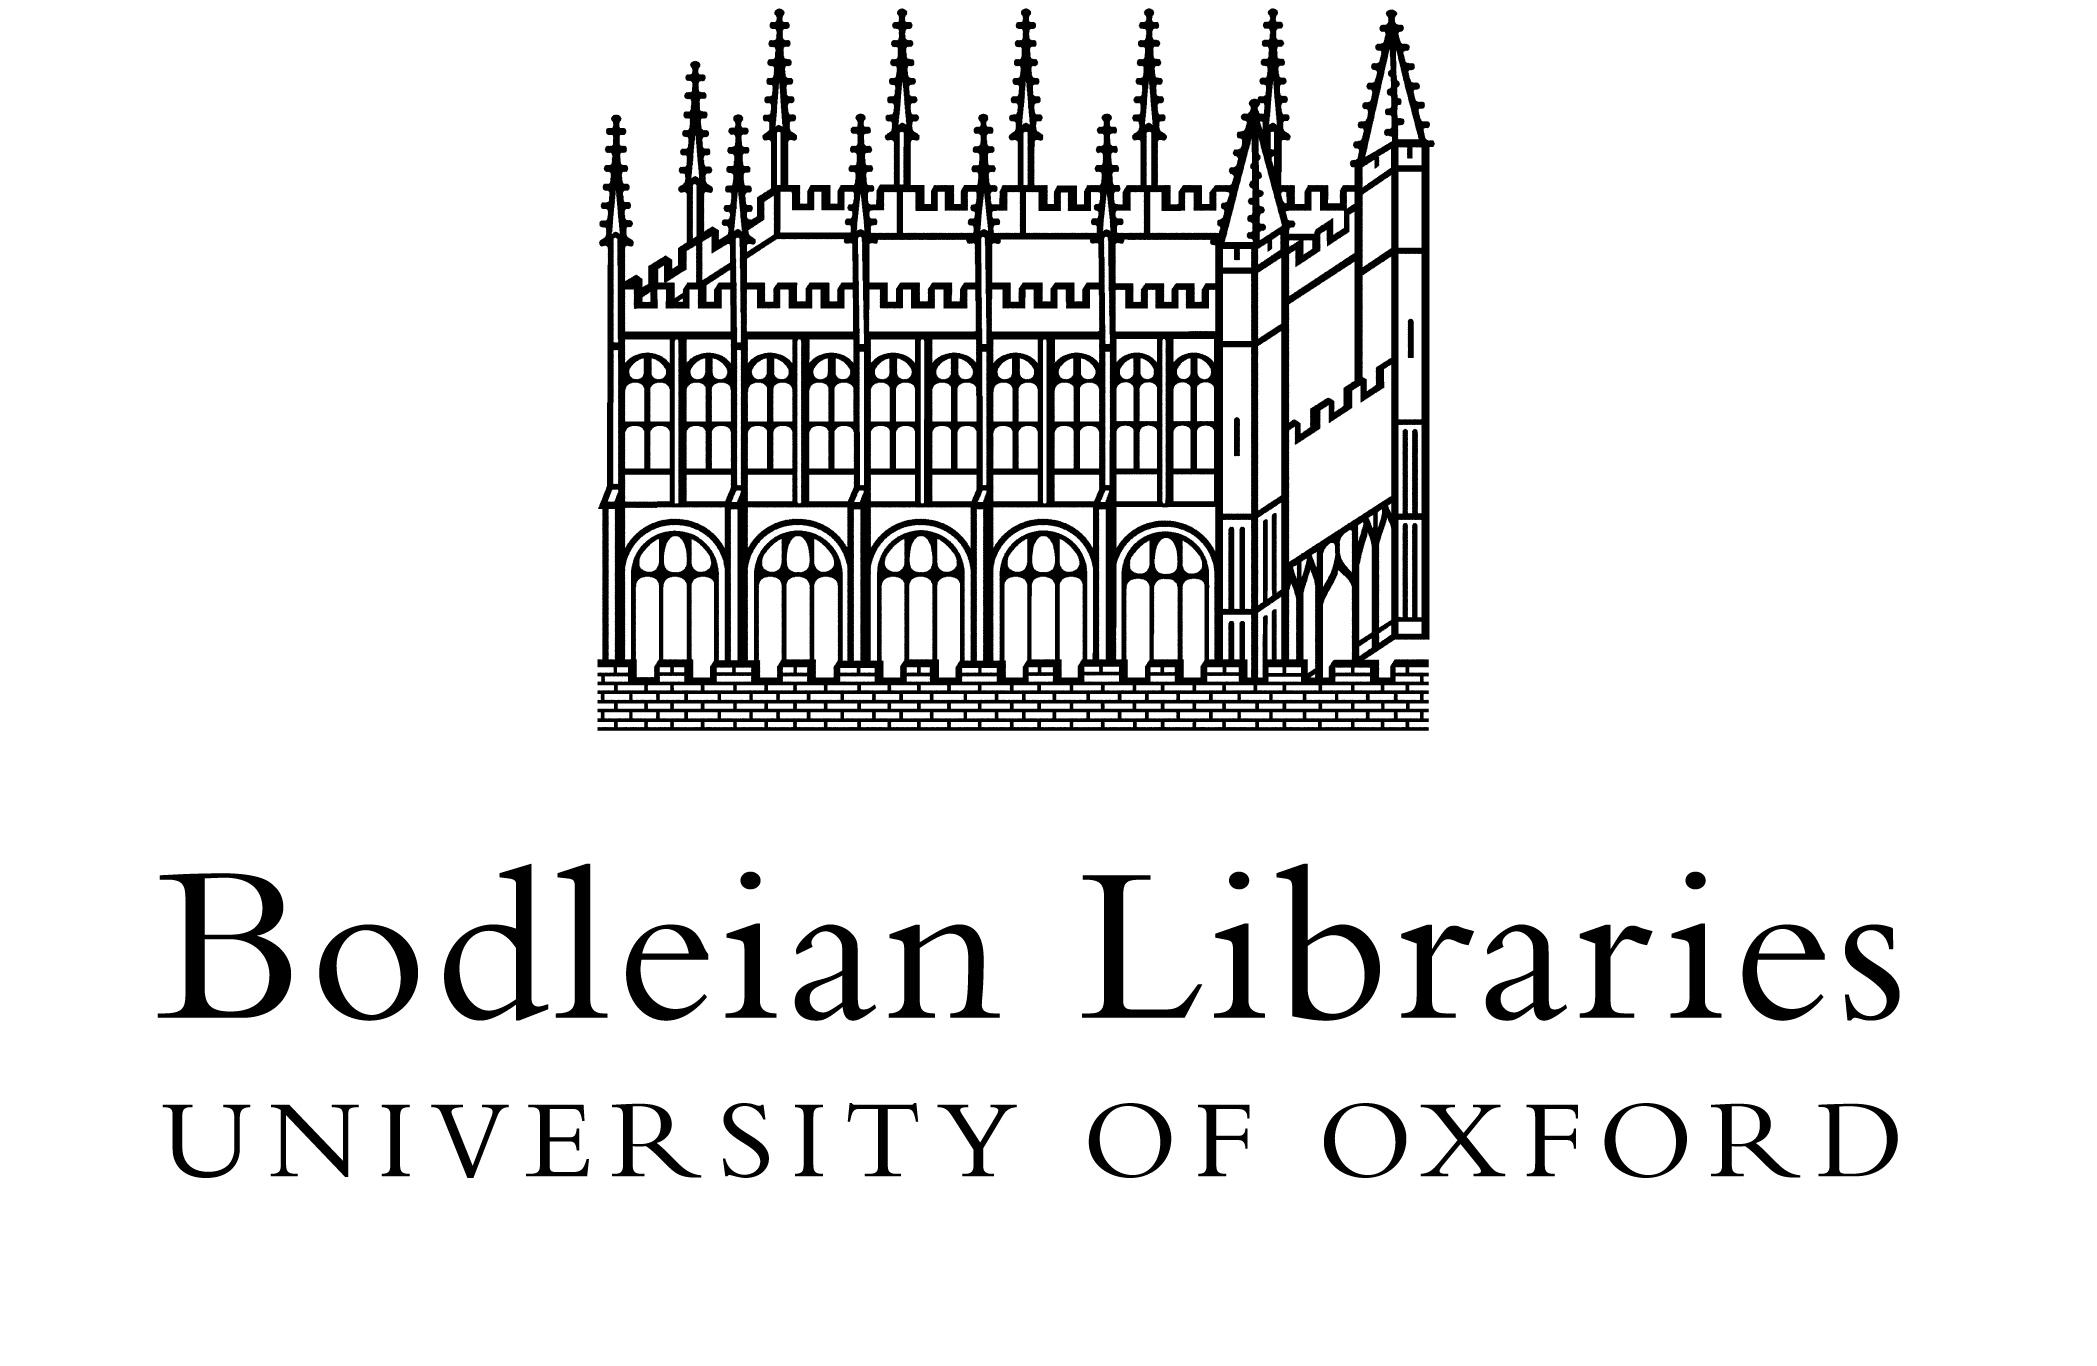 Bodelian Libraries logo.jpg